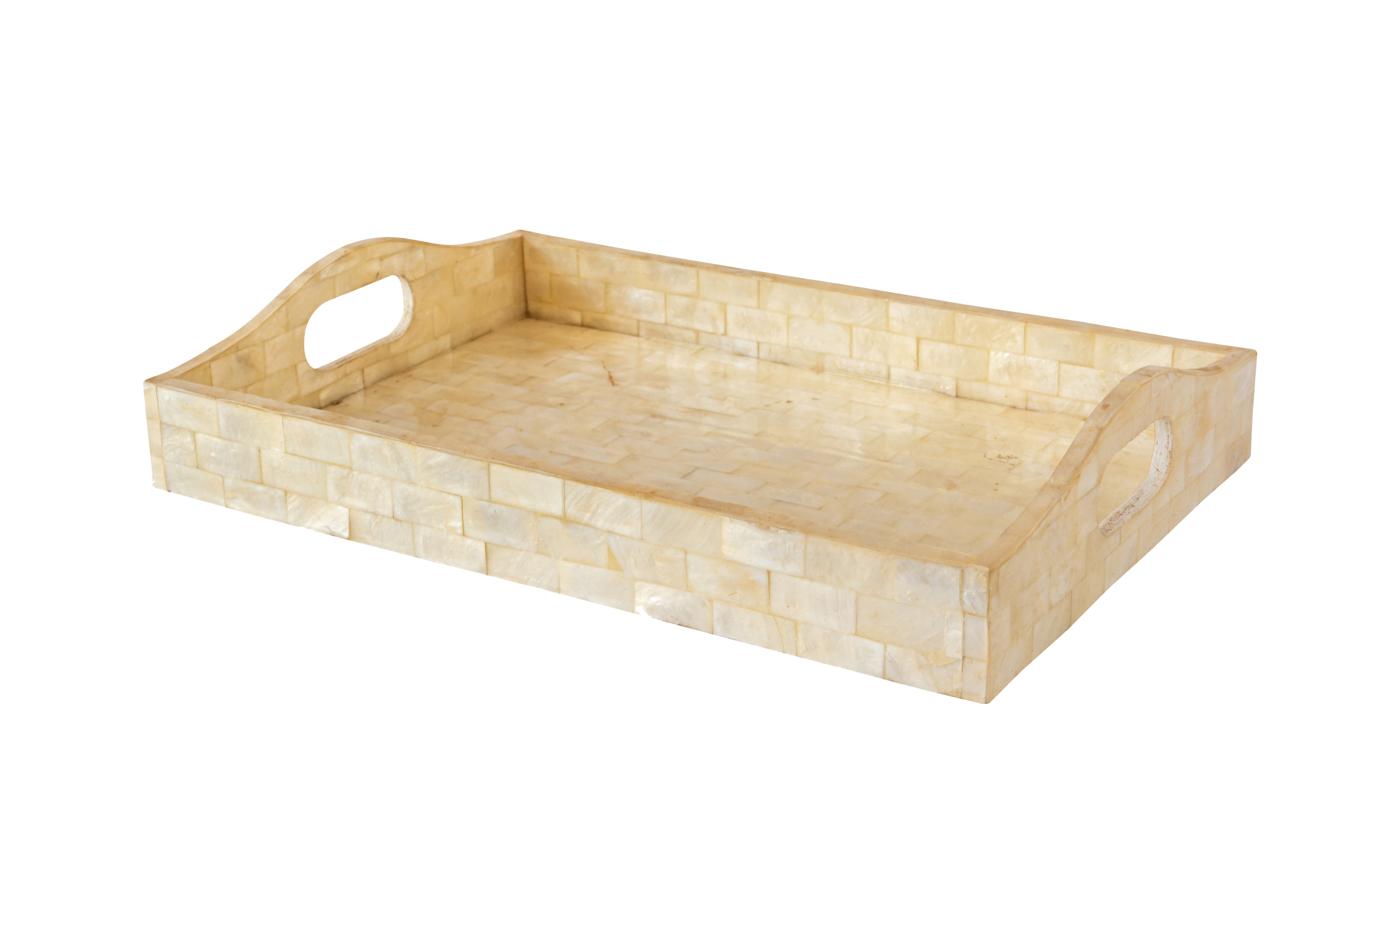 Bandeja rectangular en madera cubierta con nácar - Beige